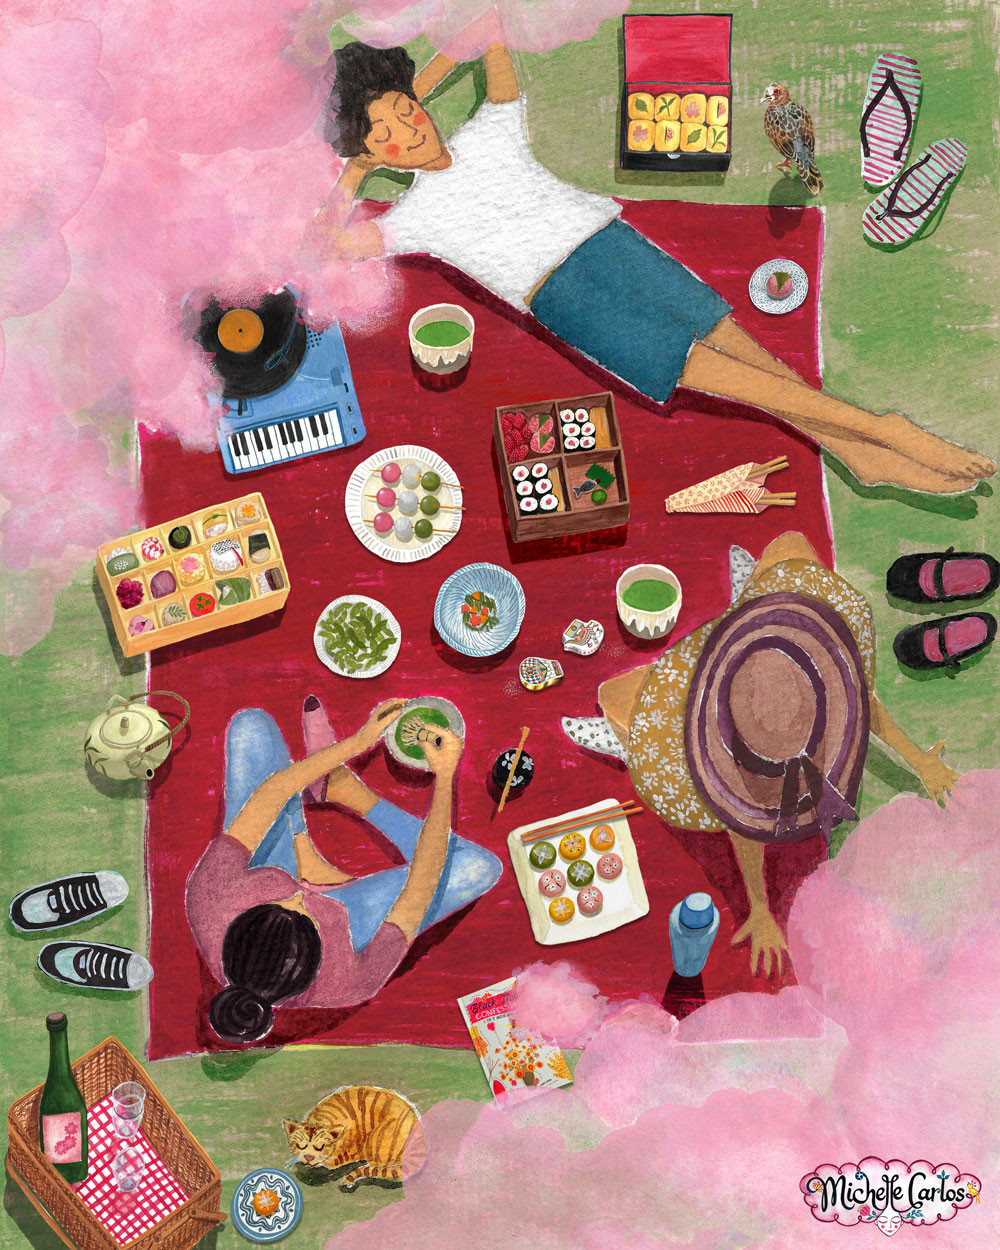 picnic under cherry blossoms